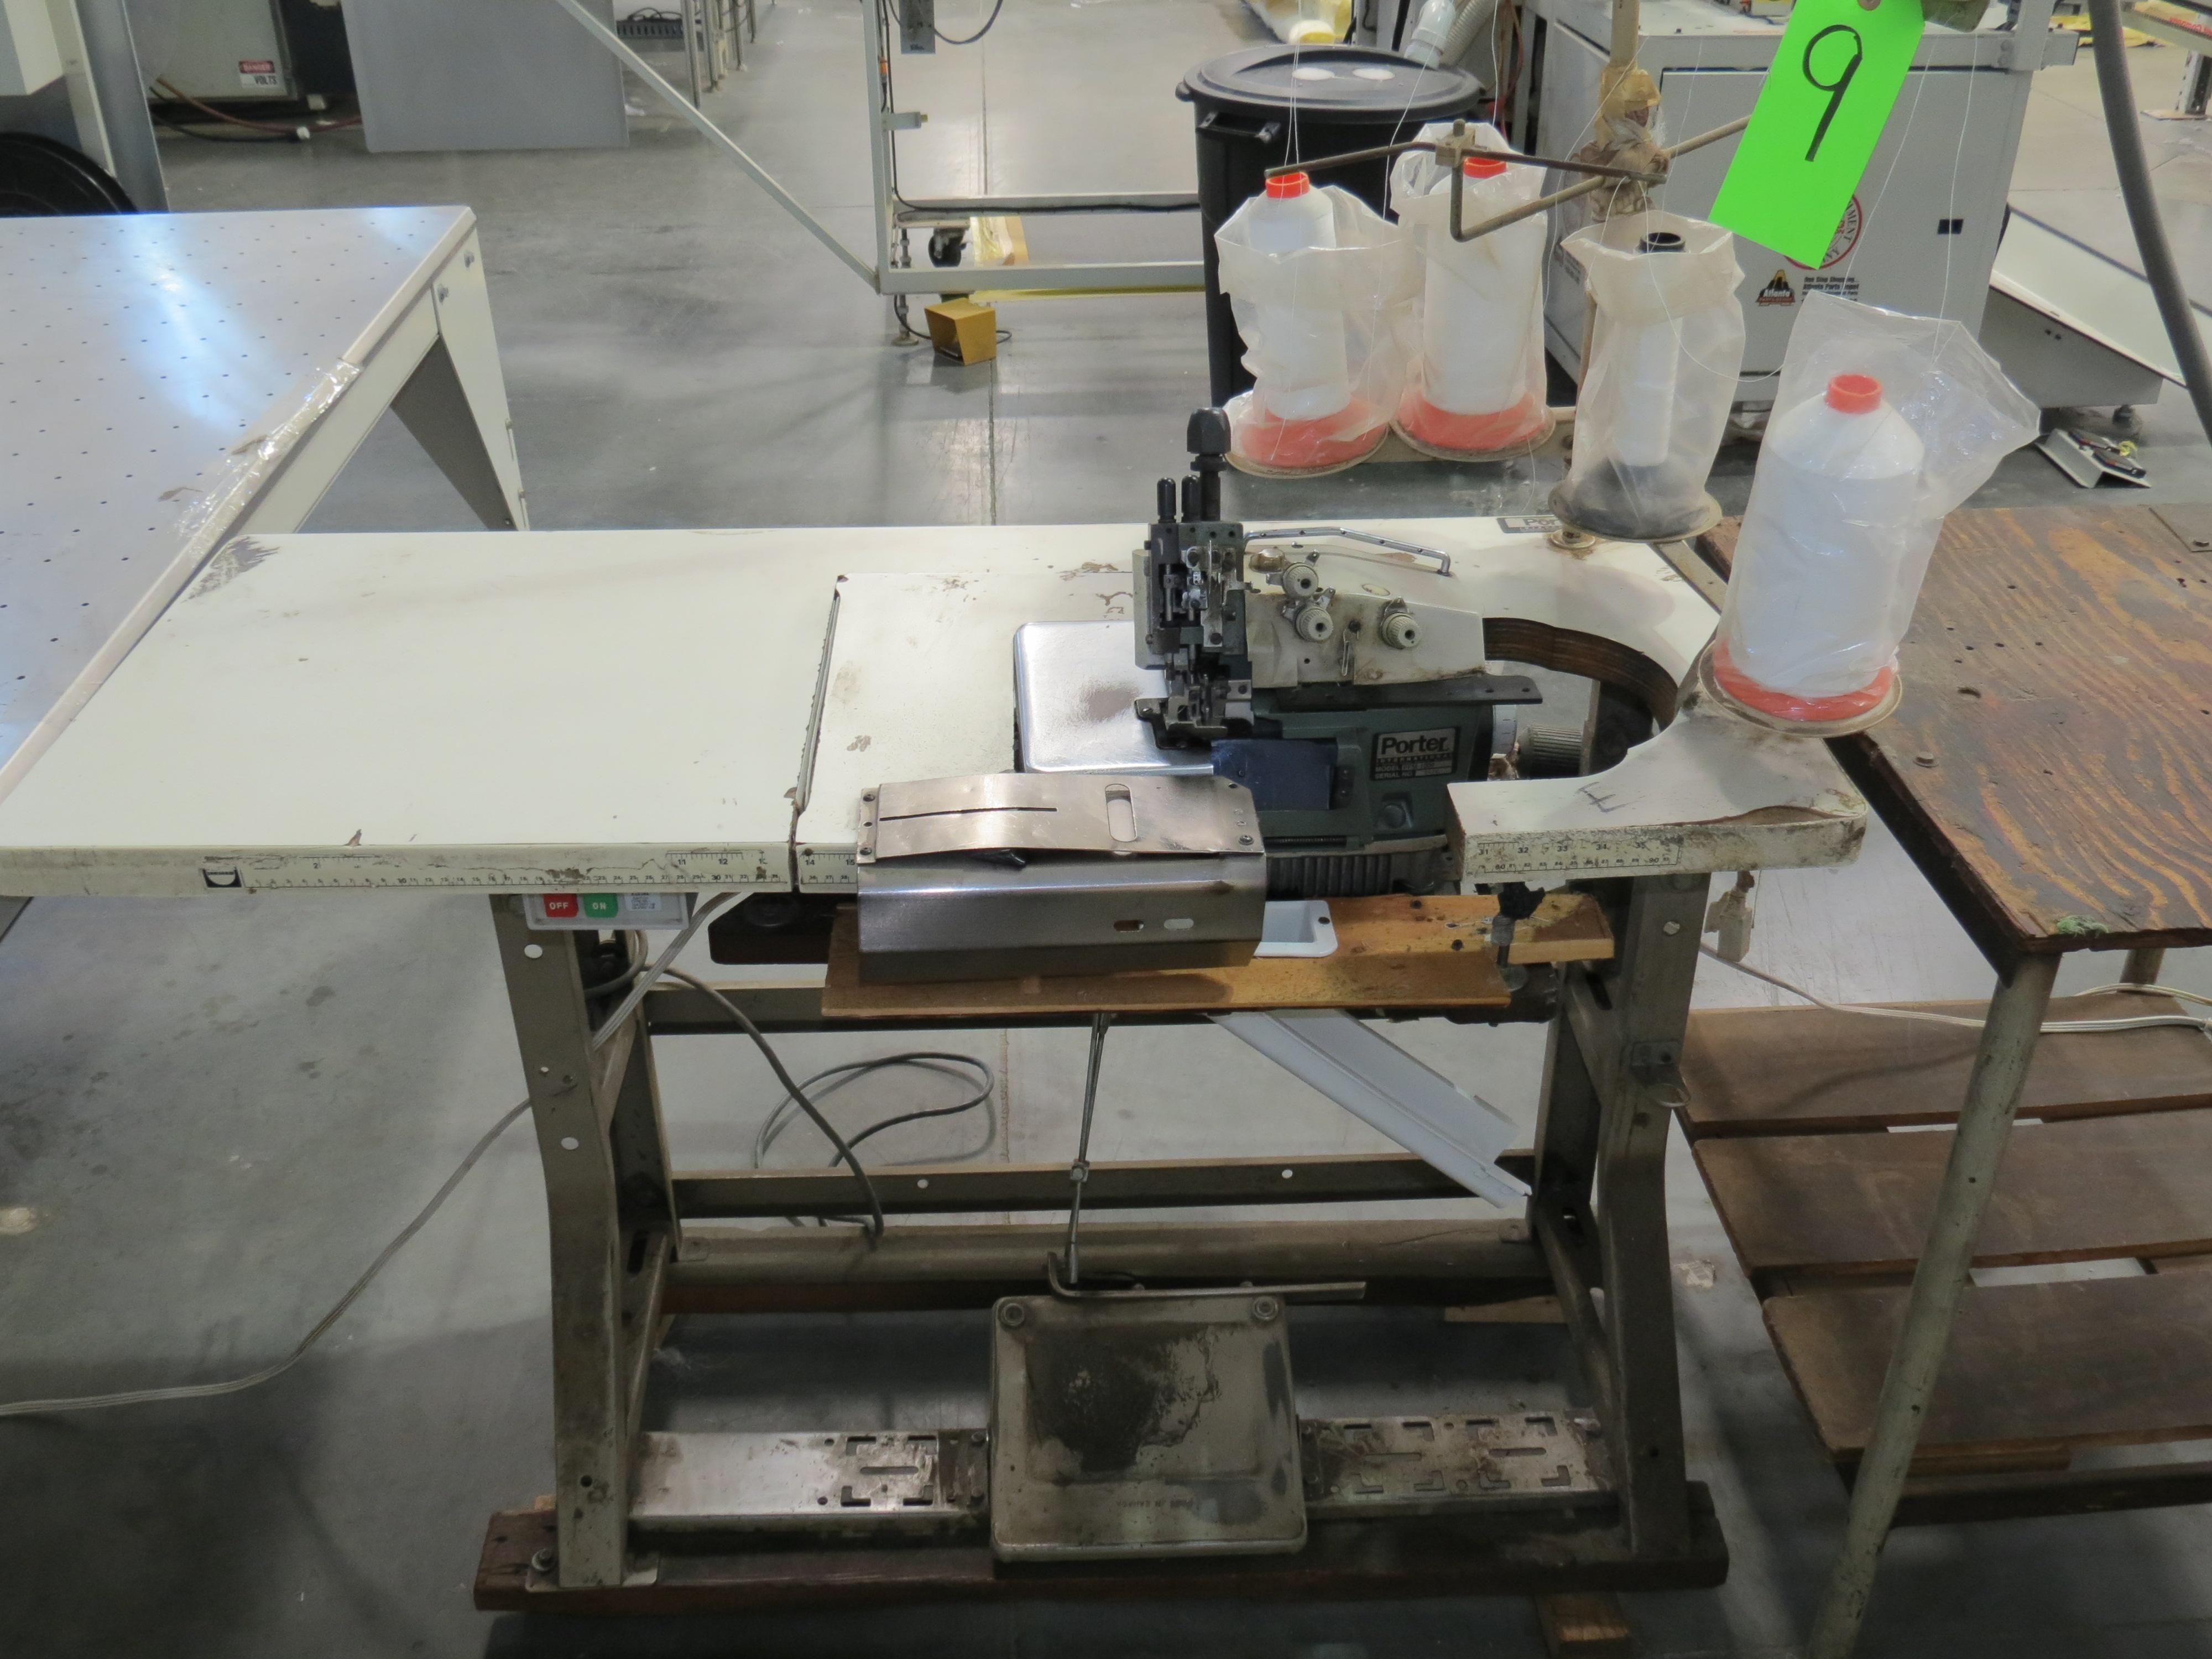 "Porter International PFM-1000 Flange Sewing Machine, with Floatation Table 95"" X 47"" 220V, SN:9434 - Image 2 of 3"